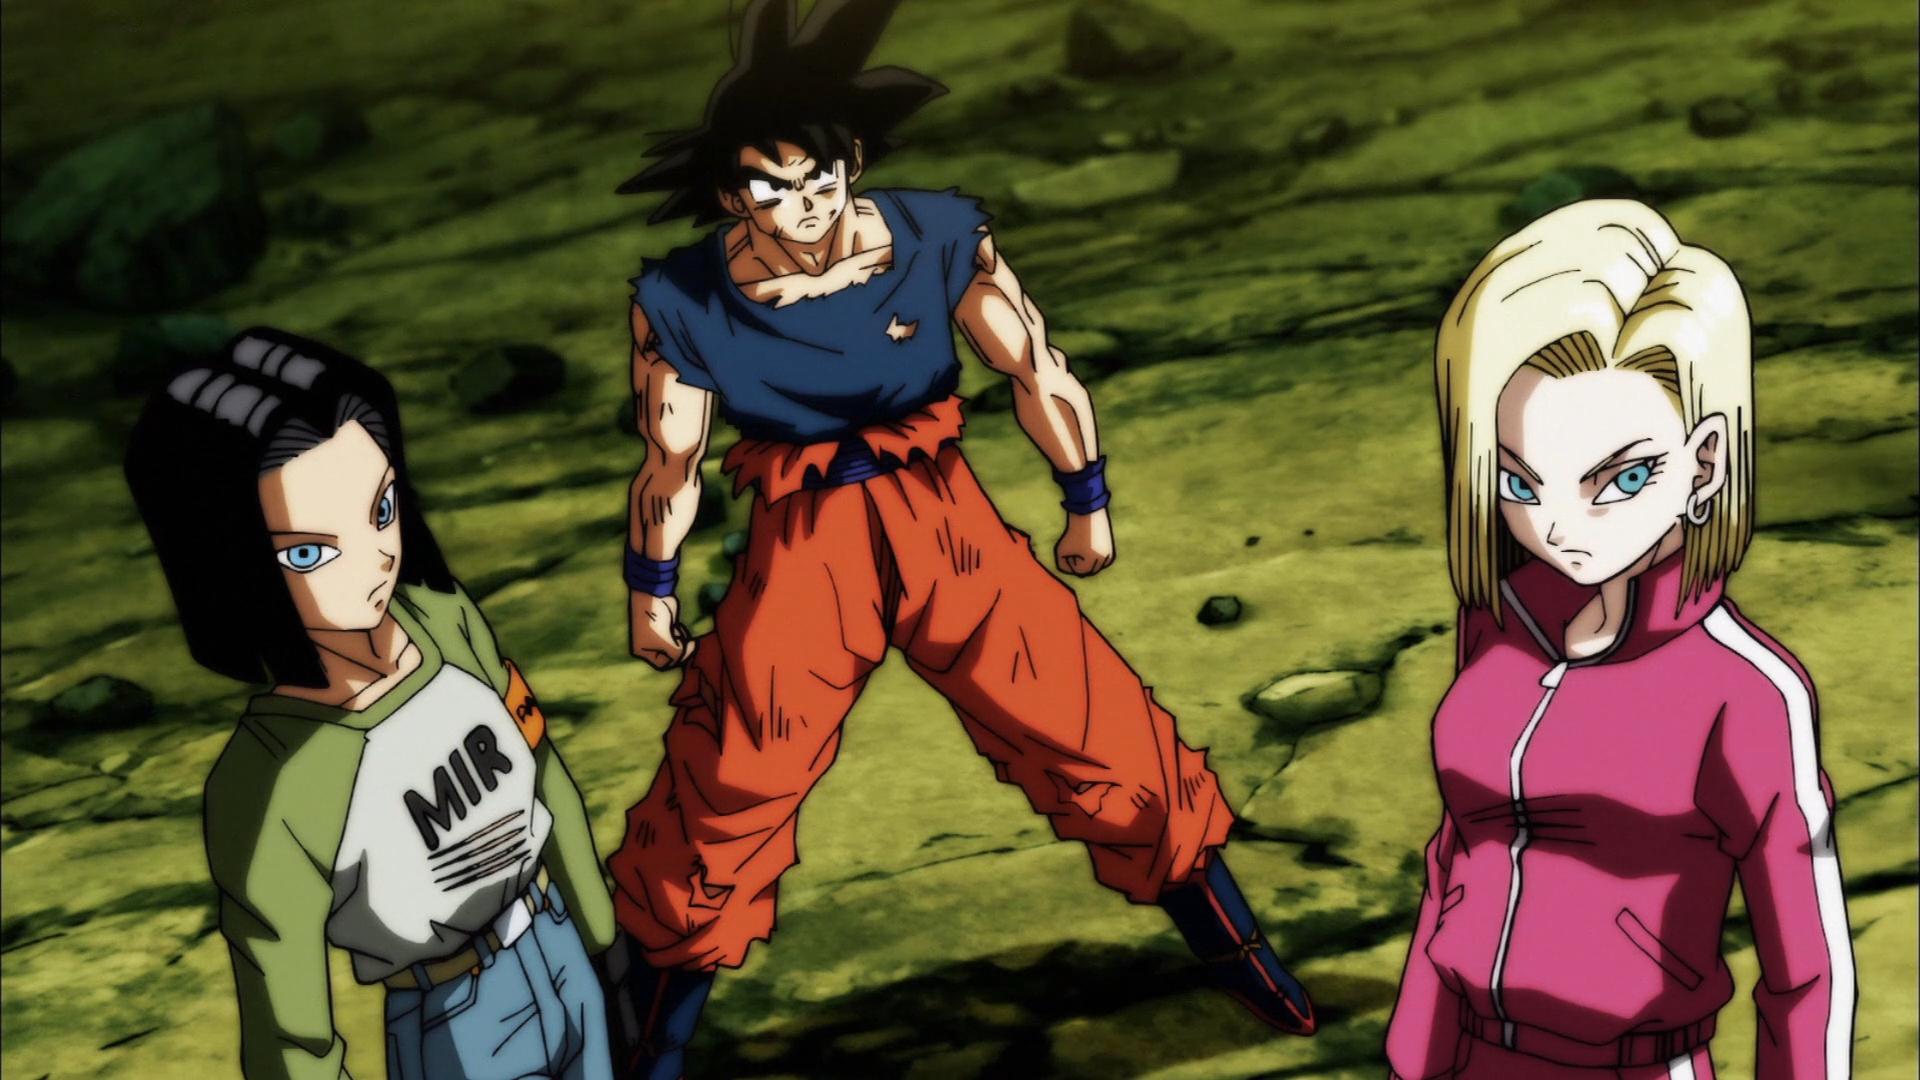 Goku C 17 And C 18 Hd Wallpaper Background Image 1920x1080